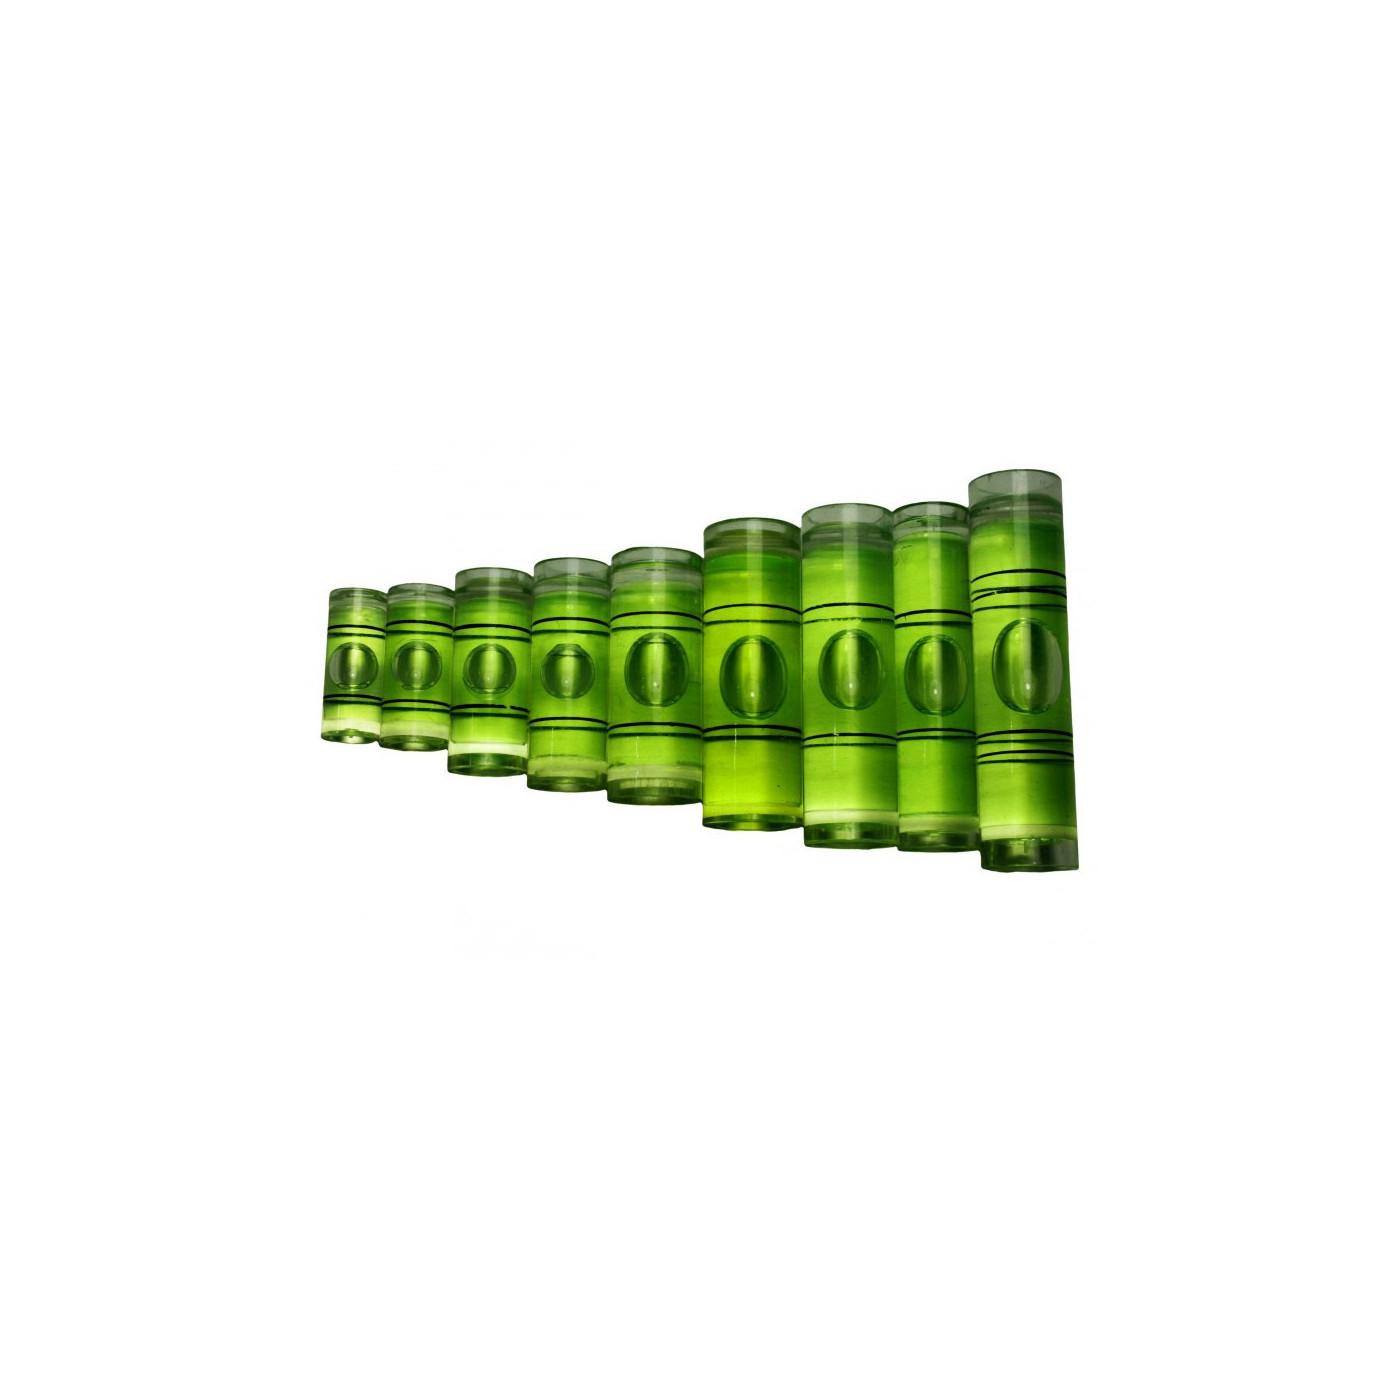 Set of 20 vials for spirit levels (size 3, green)